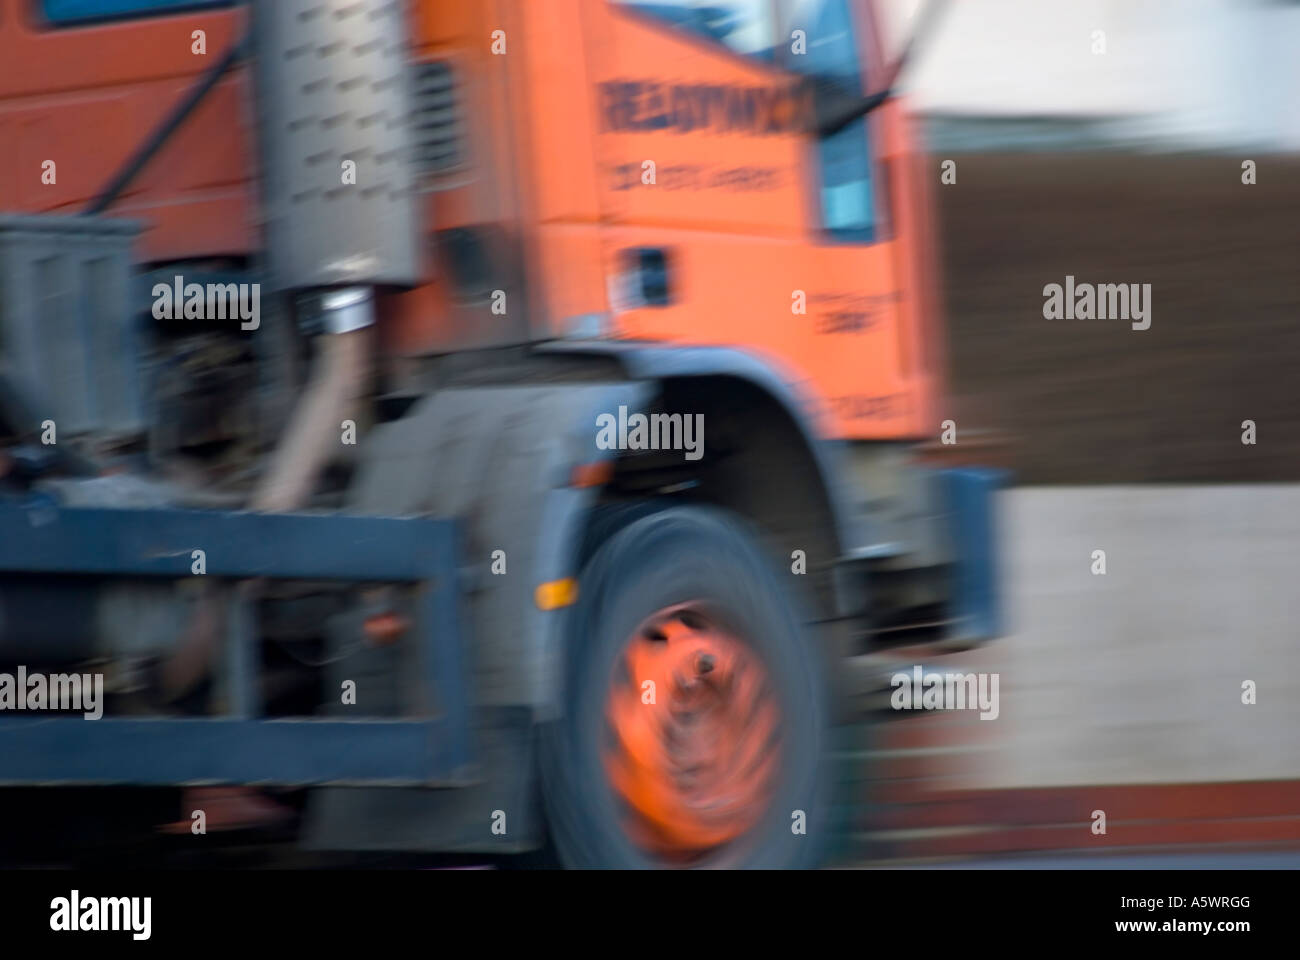 beton lkw orange fertigmischung stockfoto, bild: 11394735 - alamy